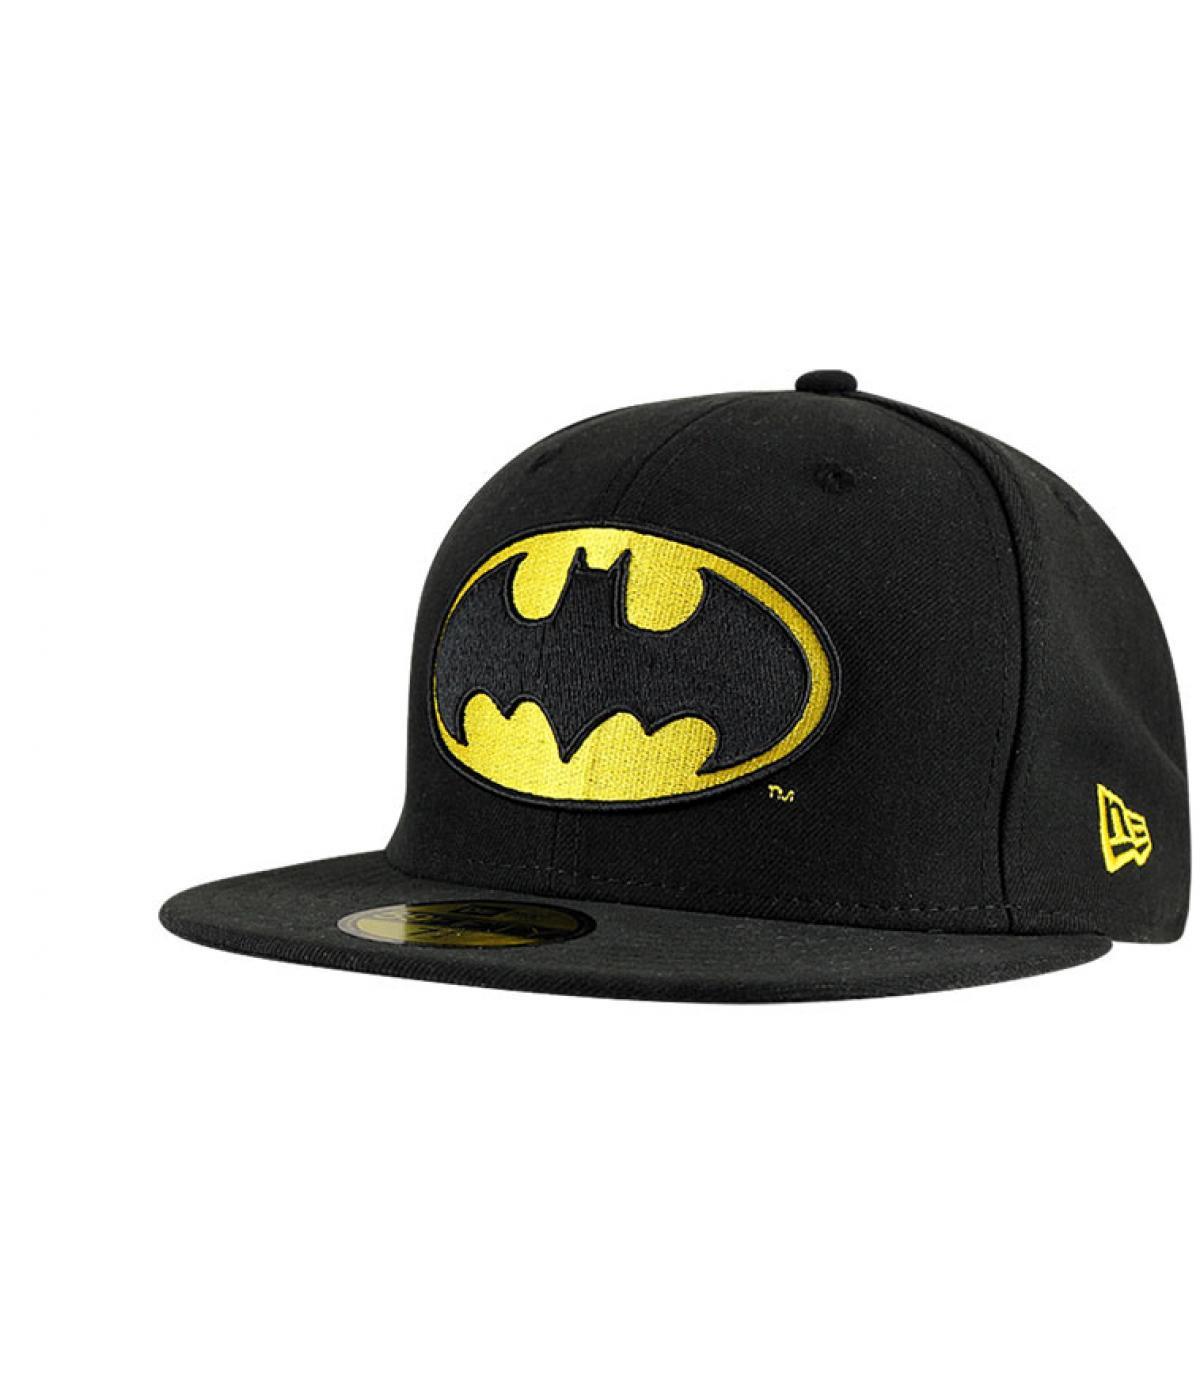 59fifty visor story Batman